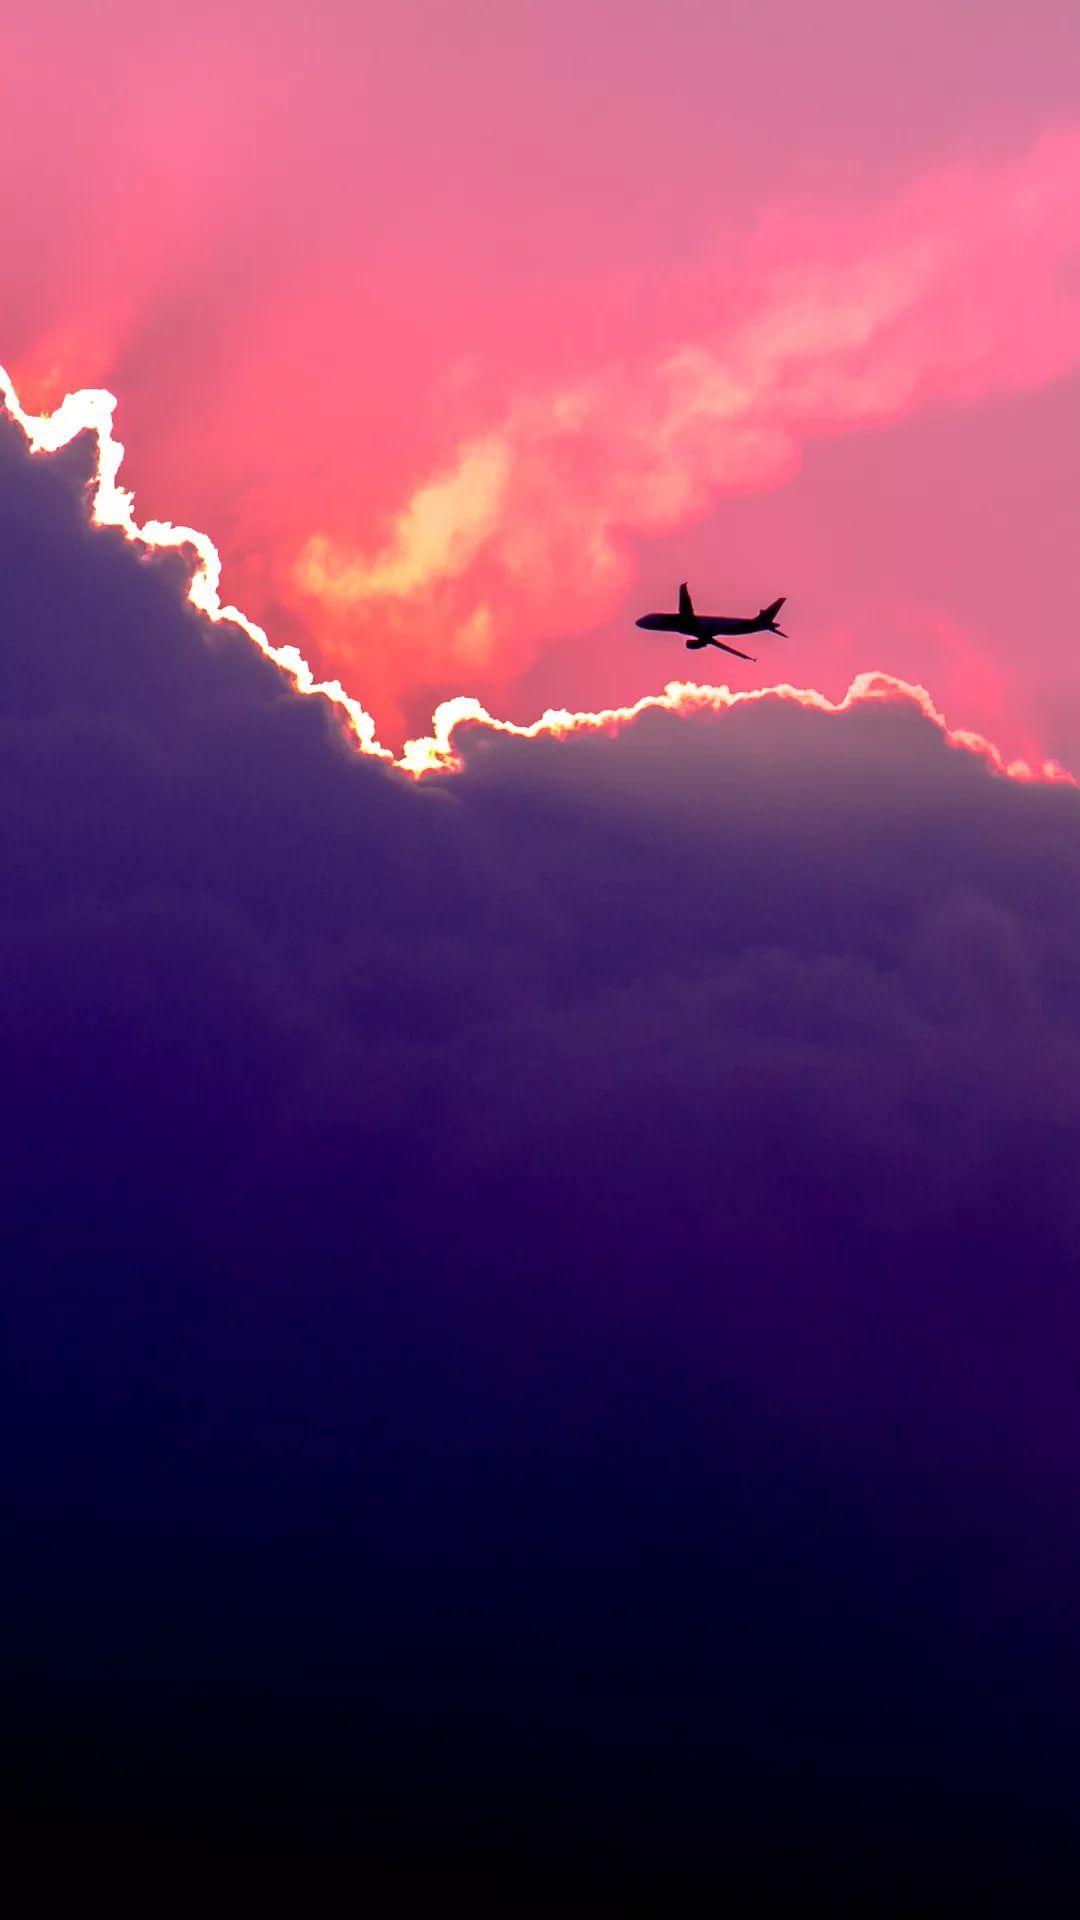 Sunset Sky Iphone Wallpaper